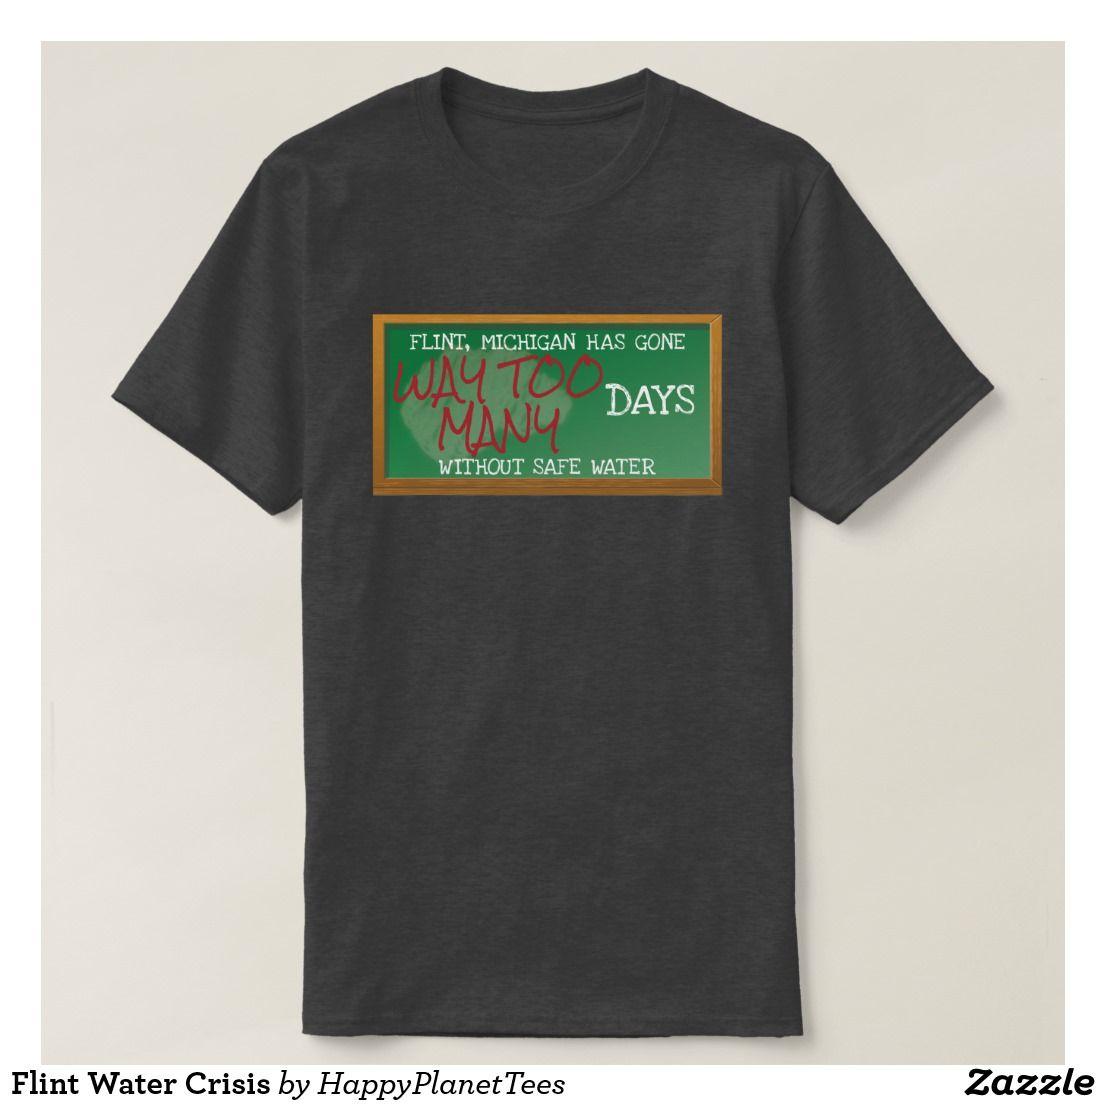 Flint Water Crisis T Shirt Zazzle Com Flint Water Crisis Flint Water Water Crisis